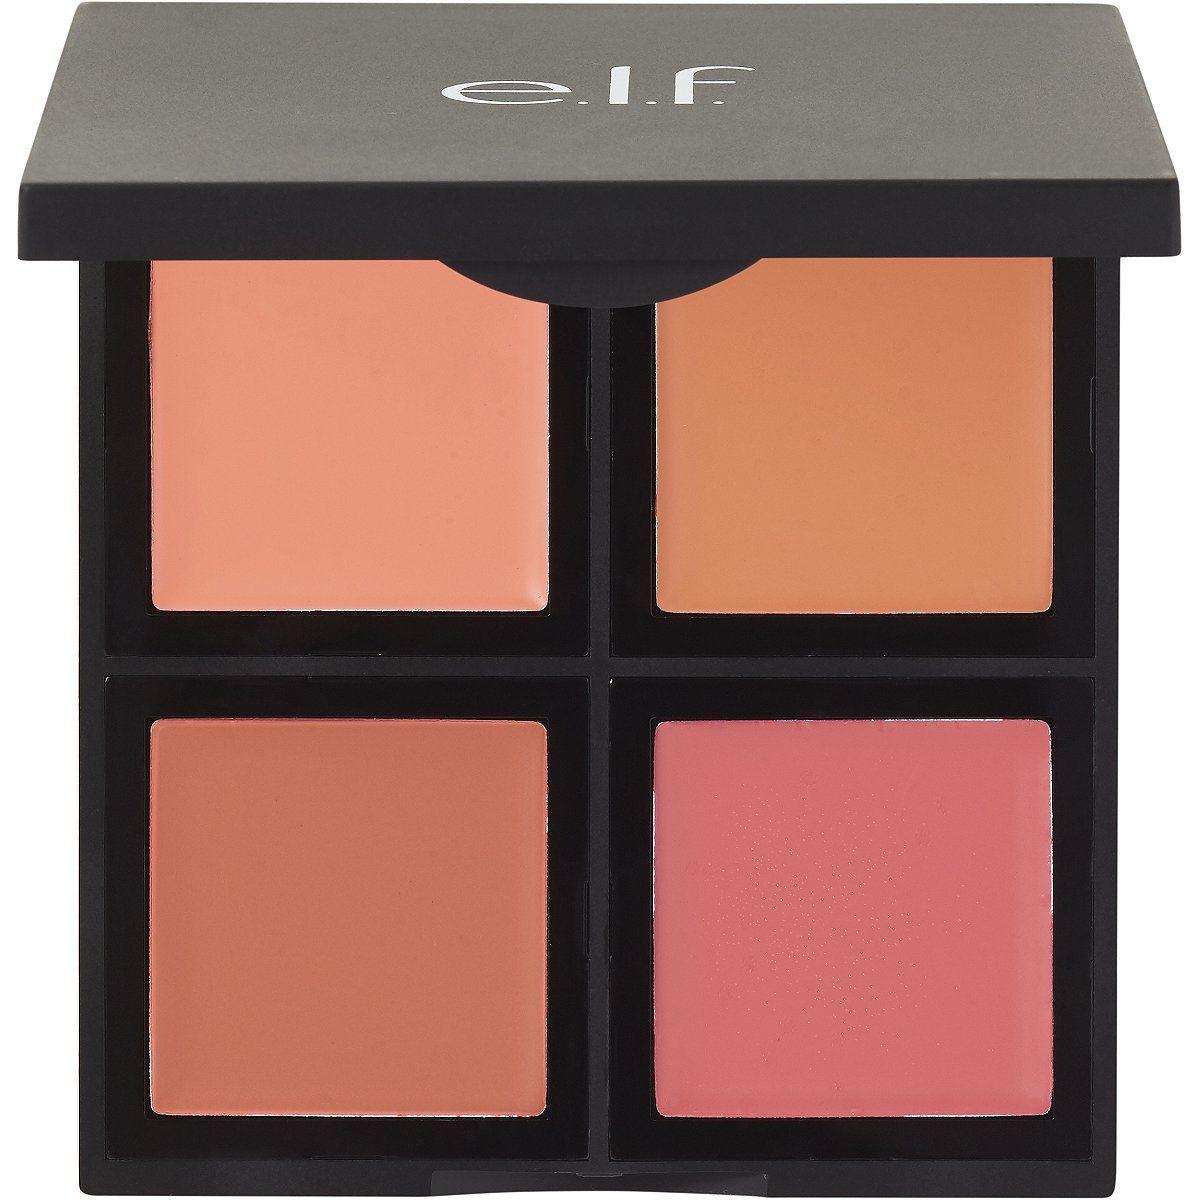 e.l.f. Cosmetics Cream Blush Palette Ulta Beauty Blush